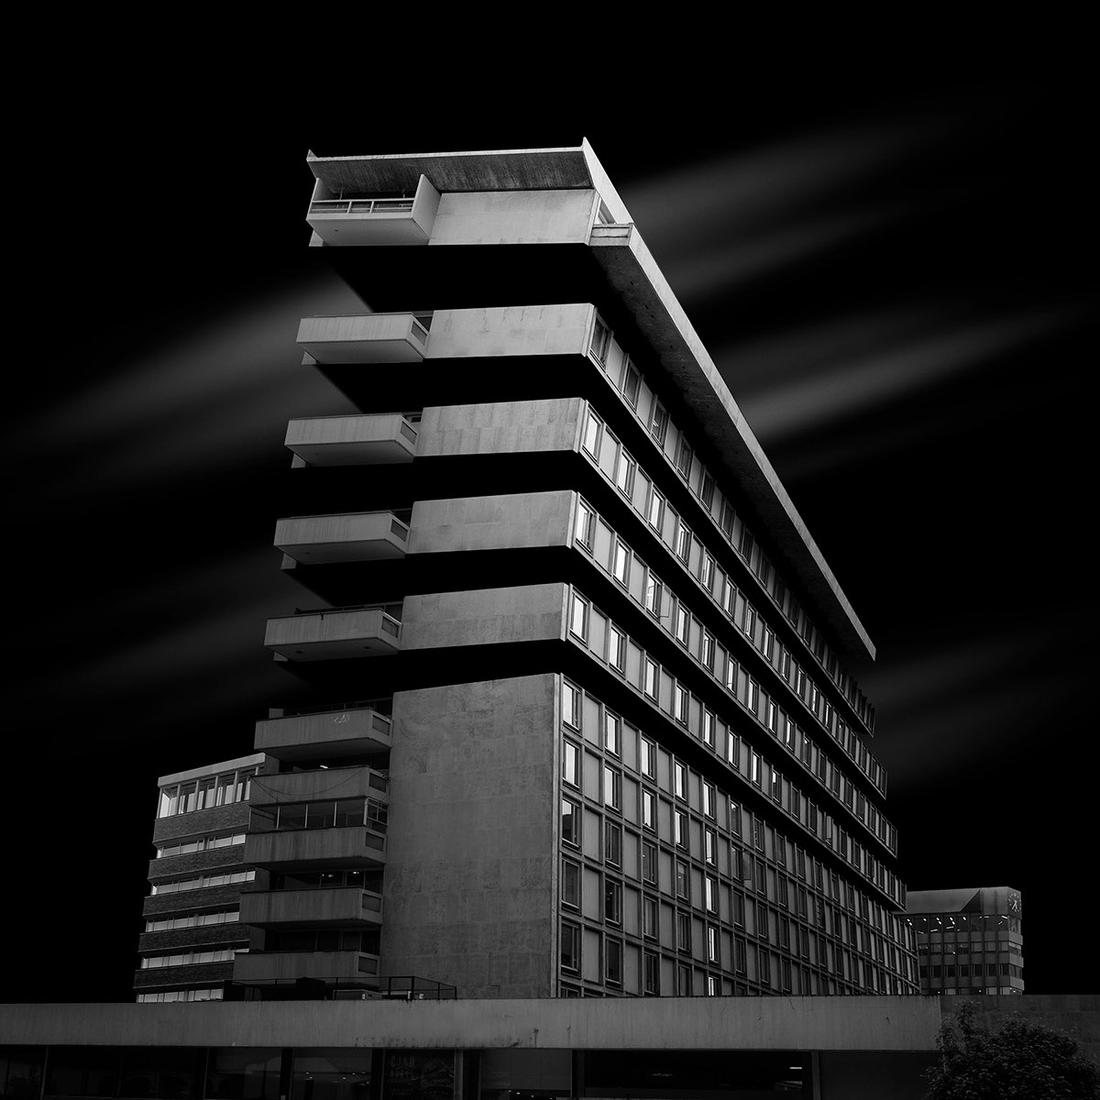 02-Daniel-Garay-Arango-Black-and-White-Surreal-Photographs-Architectural-Deconstruction-www-designstack-co